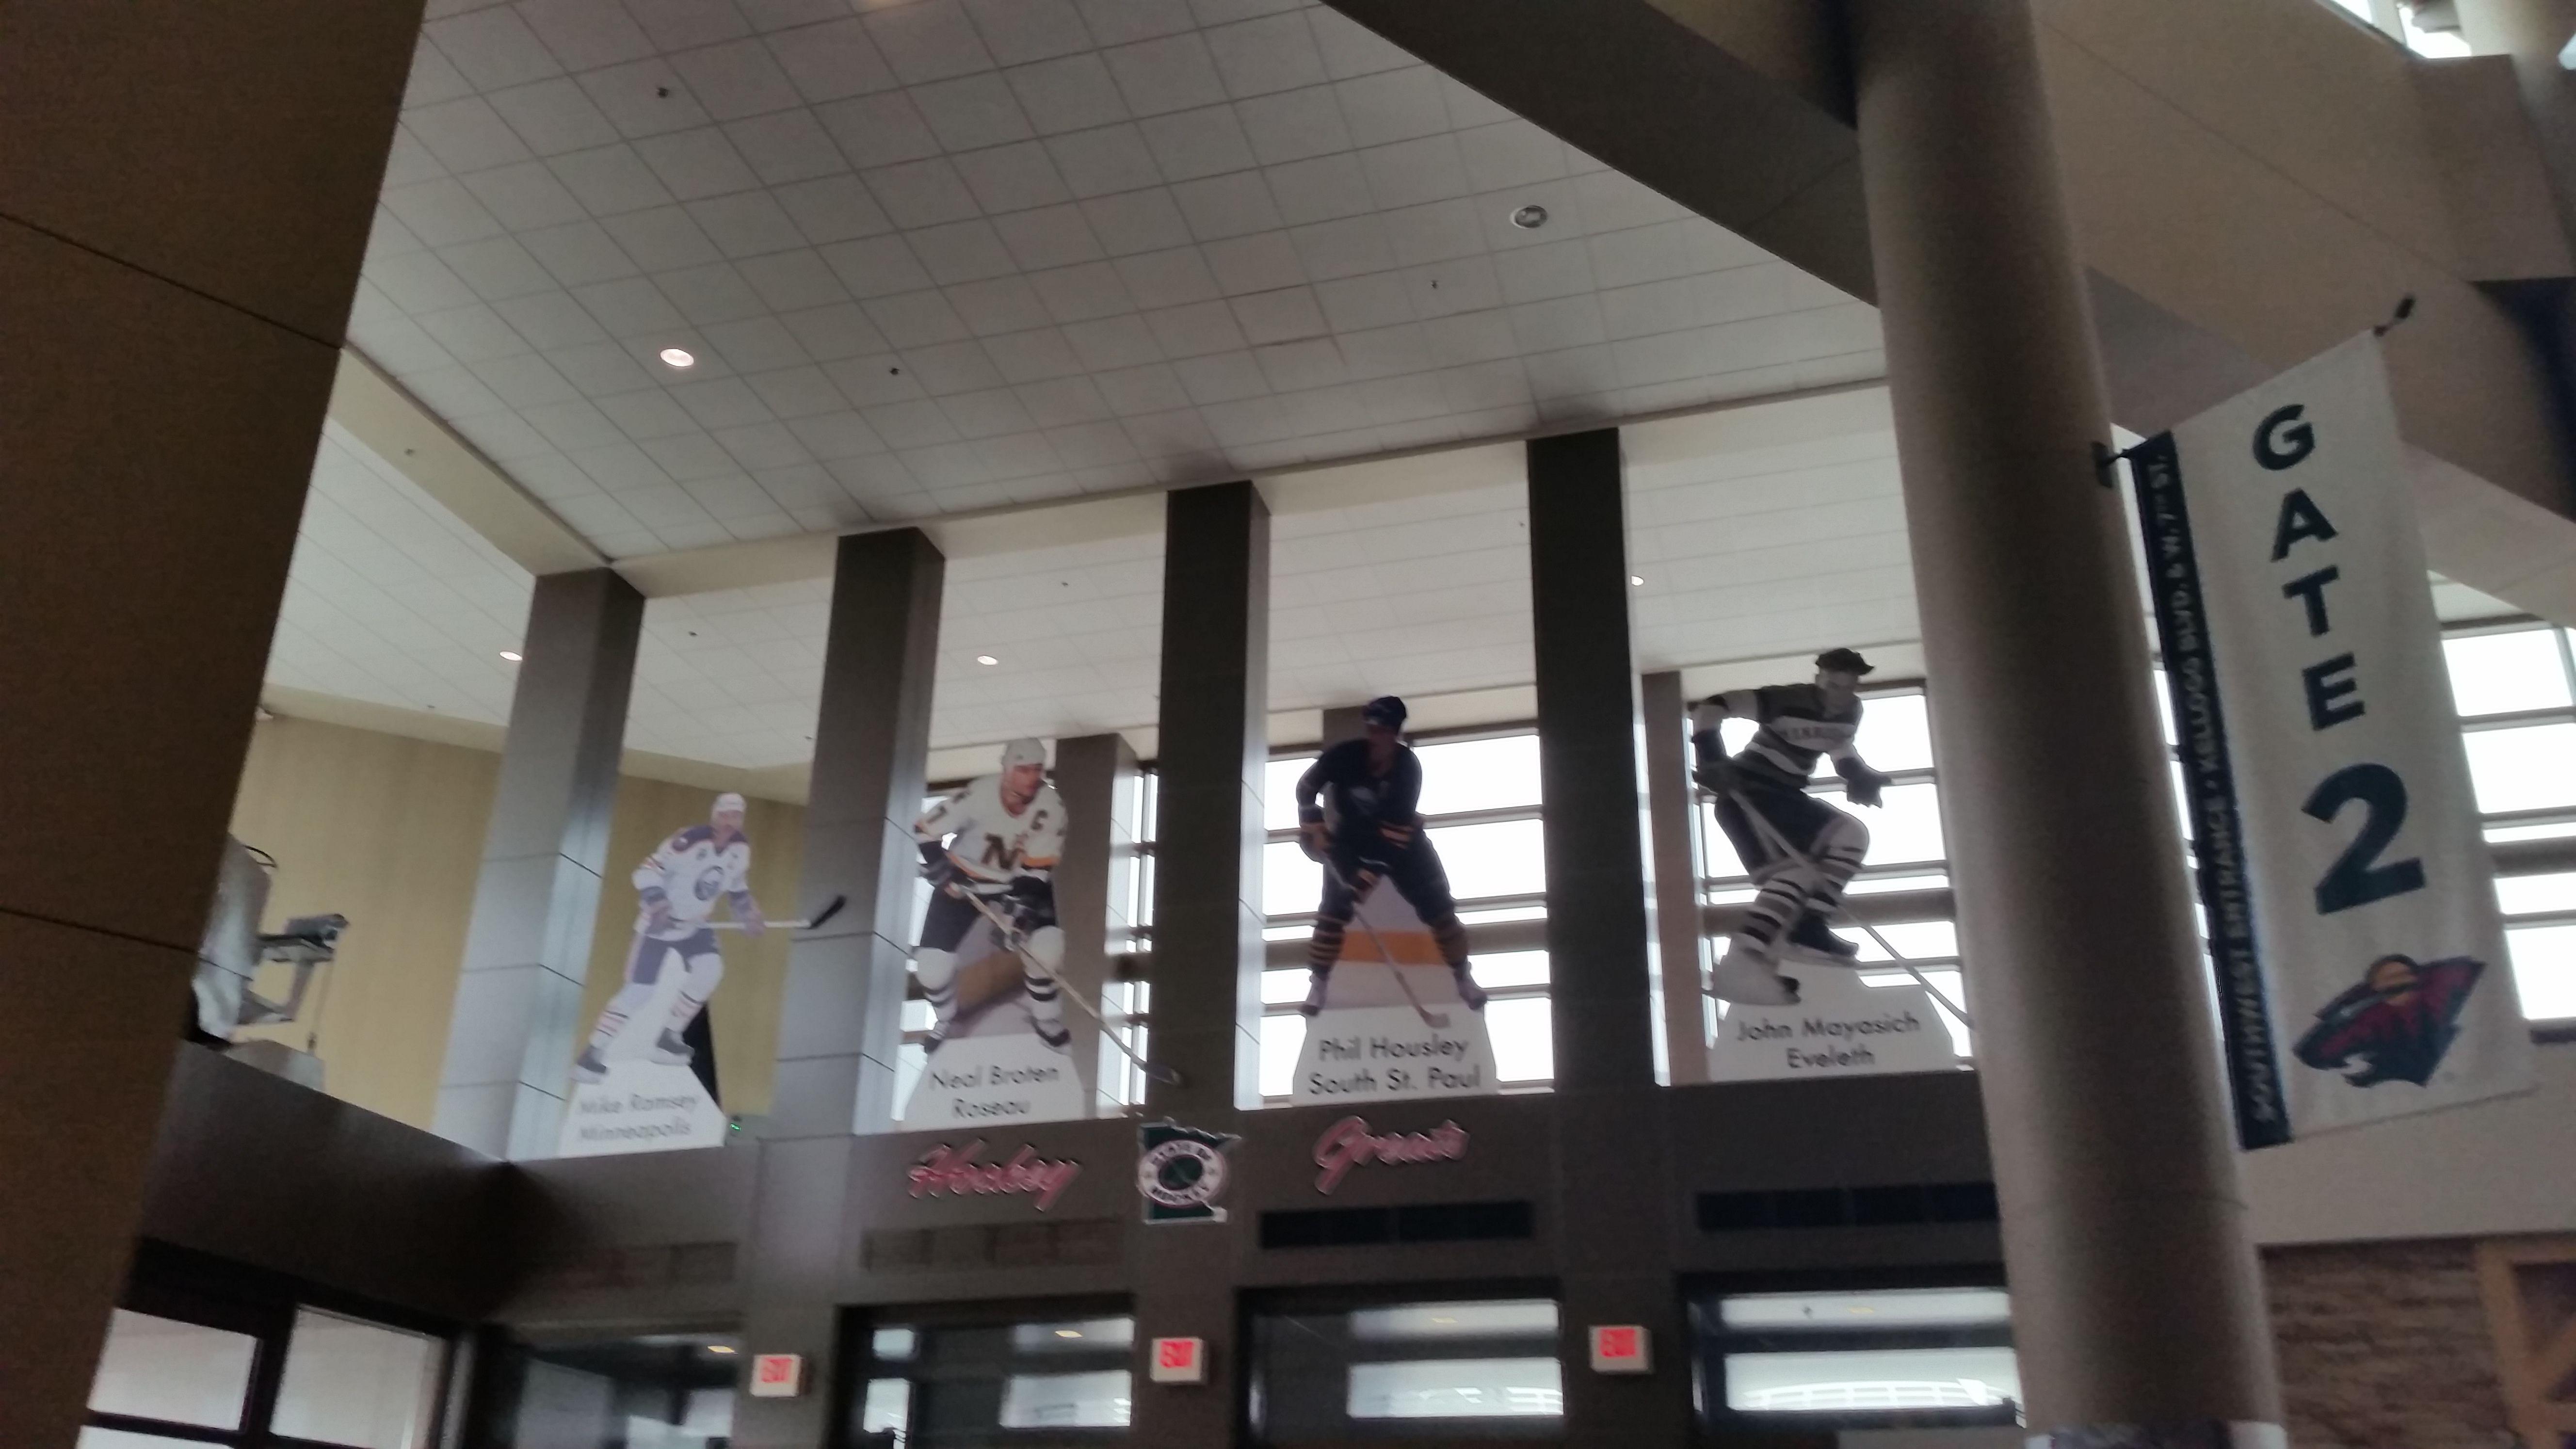 State Of Hockey Waving Flag Framed - Tour Xcel Energy